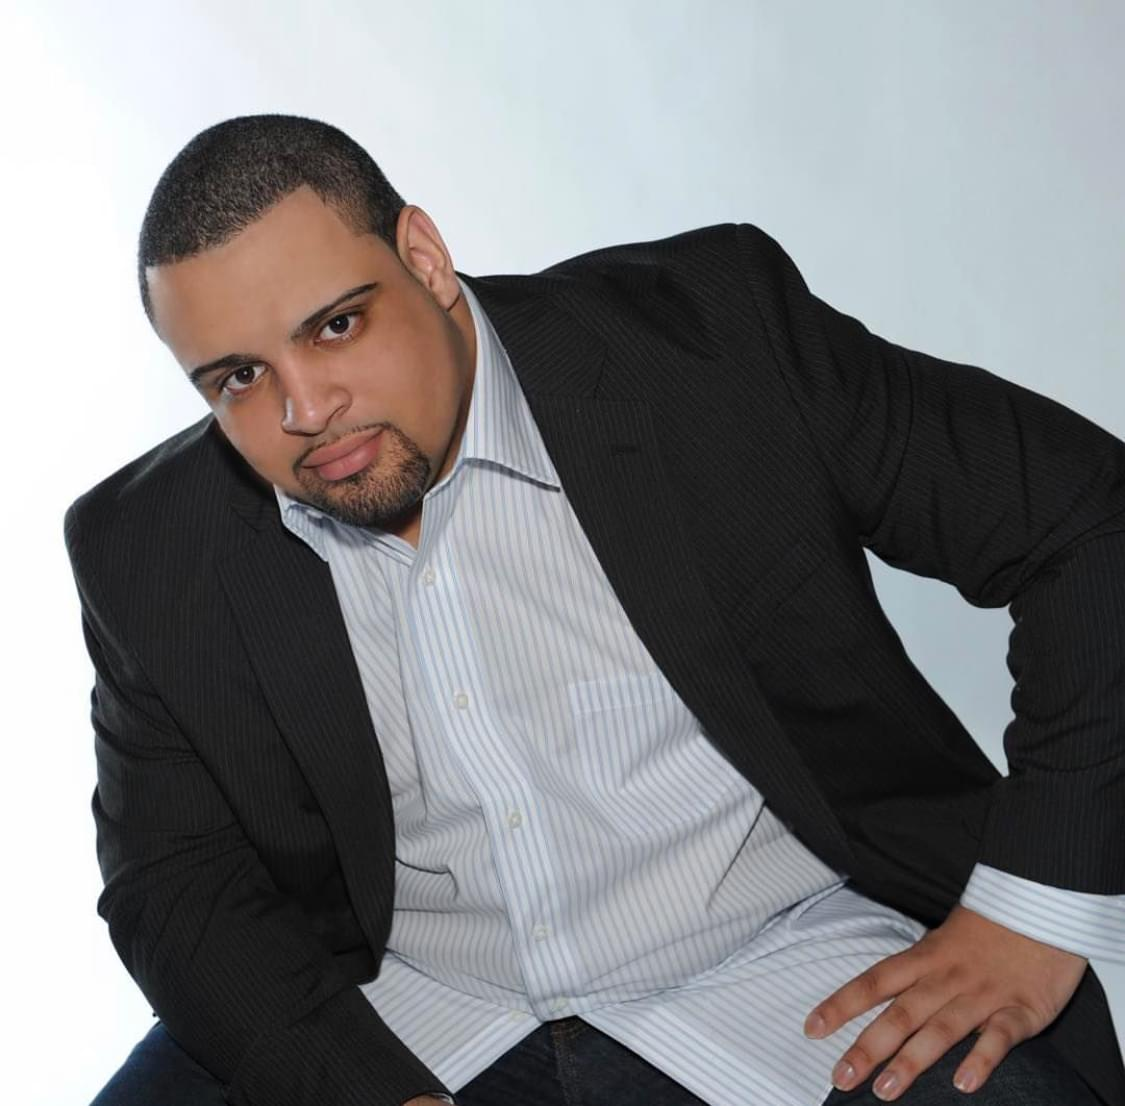 Jonathan Tineo Promoted To Program Director of El Zol Media.